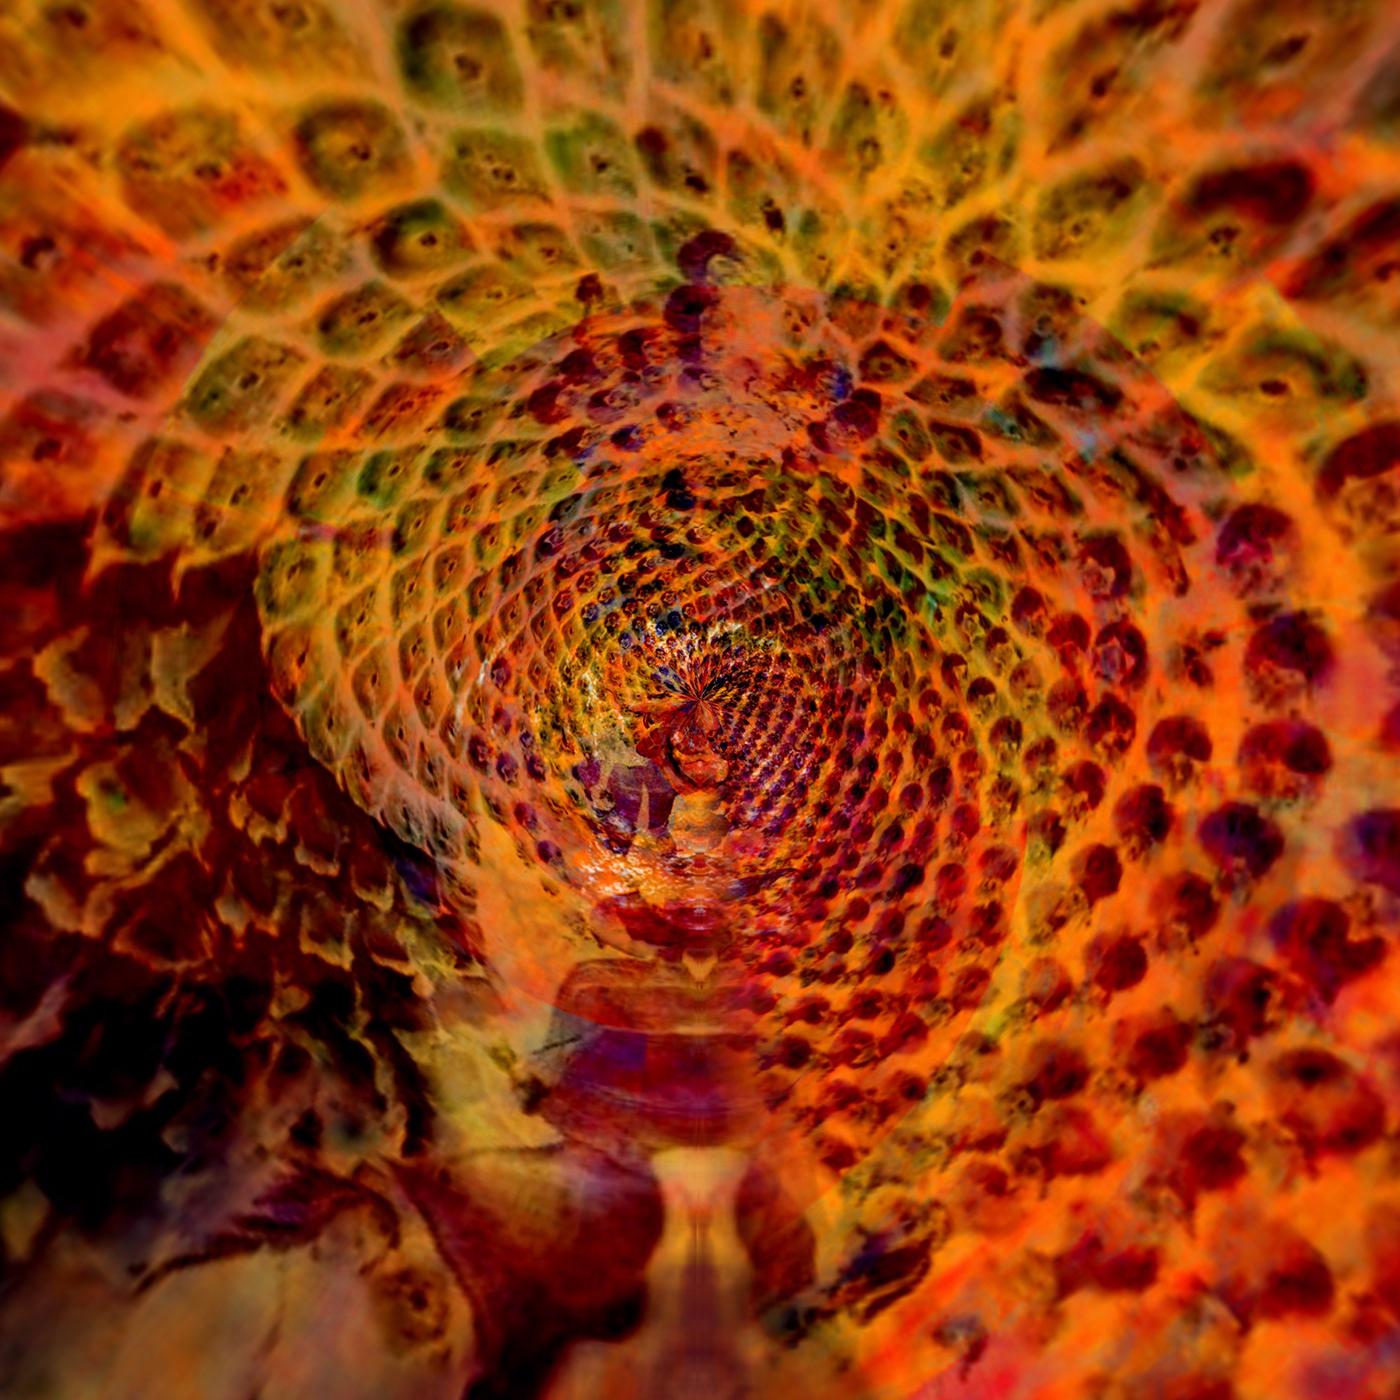 Fibonacci Spiral, digital art by Annette Emannuel